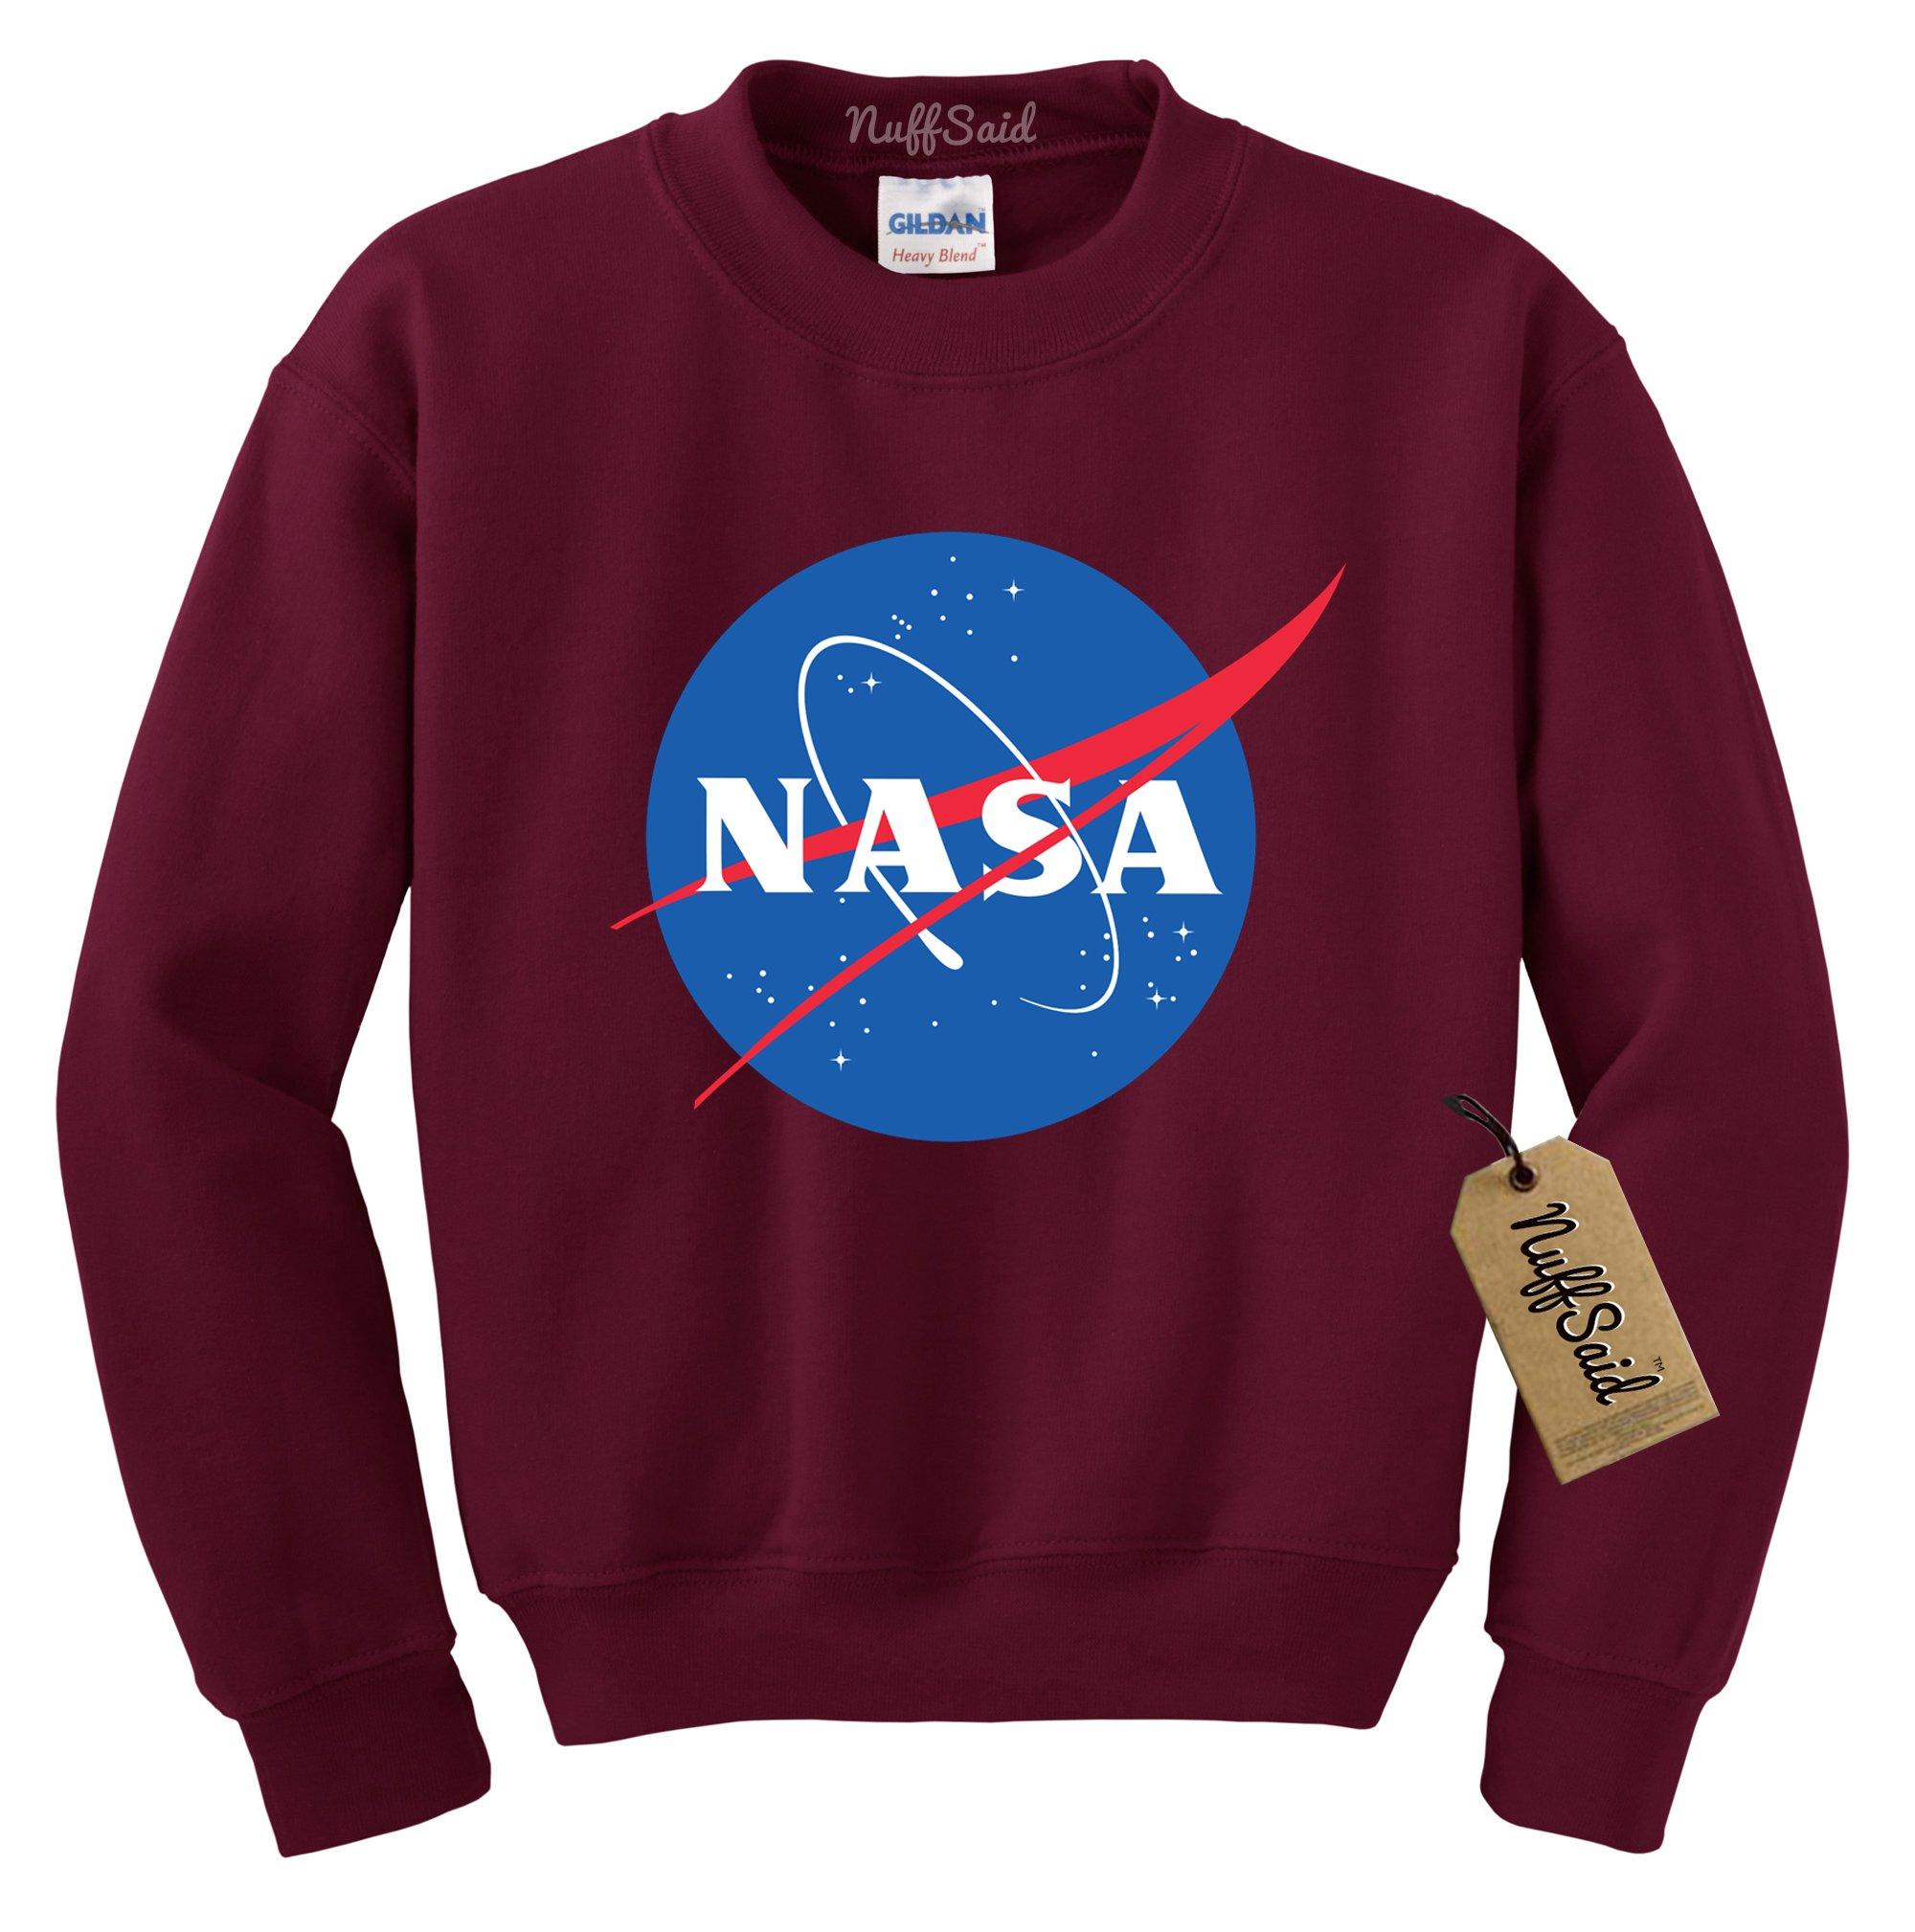 NuffSaid NASA Worm Logo Crewneck Sweatshirt Sweater Pullover - Unisex Crew (Large, Maroon)